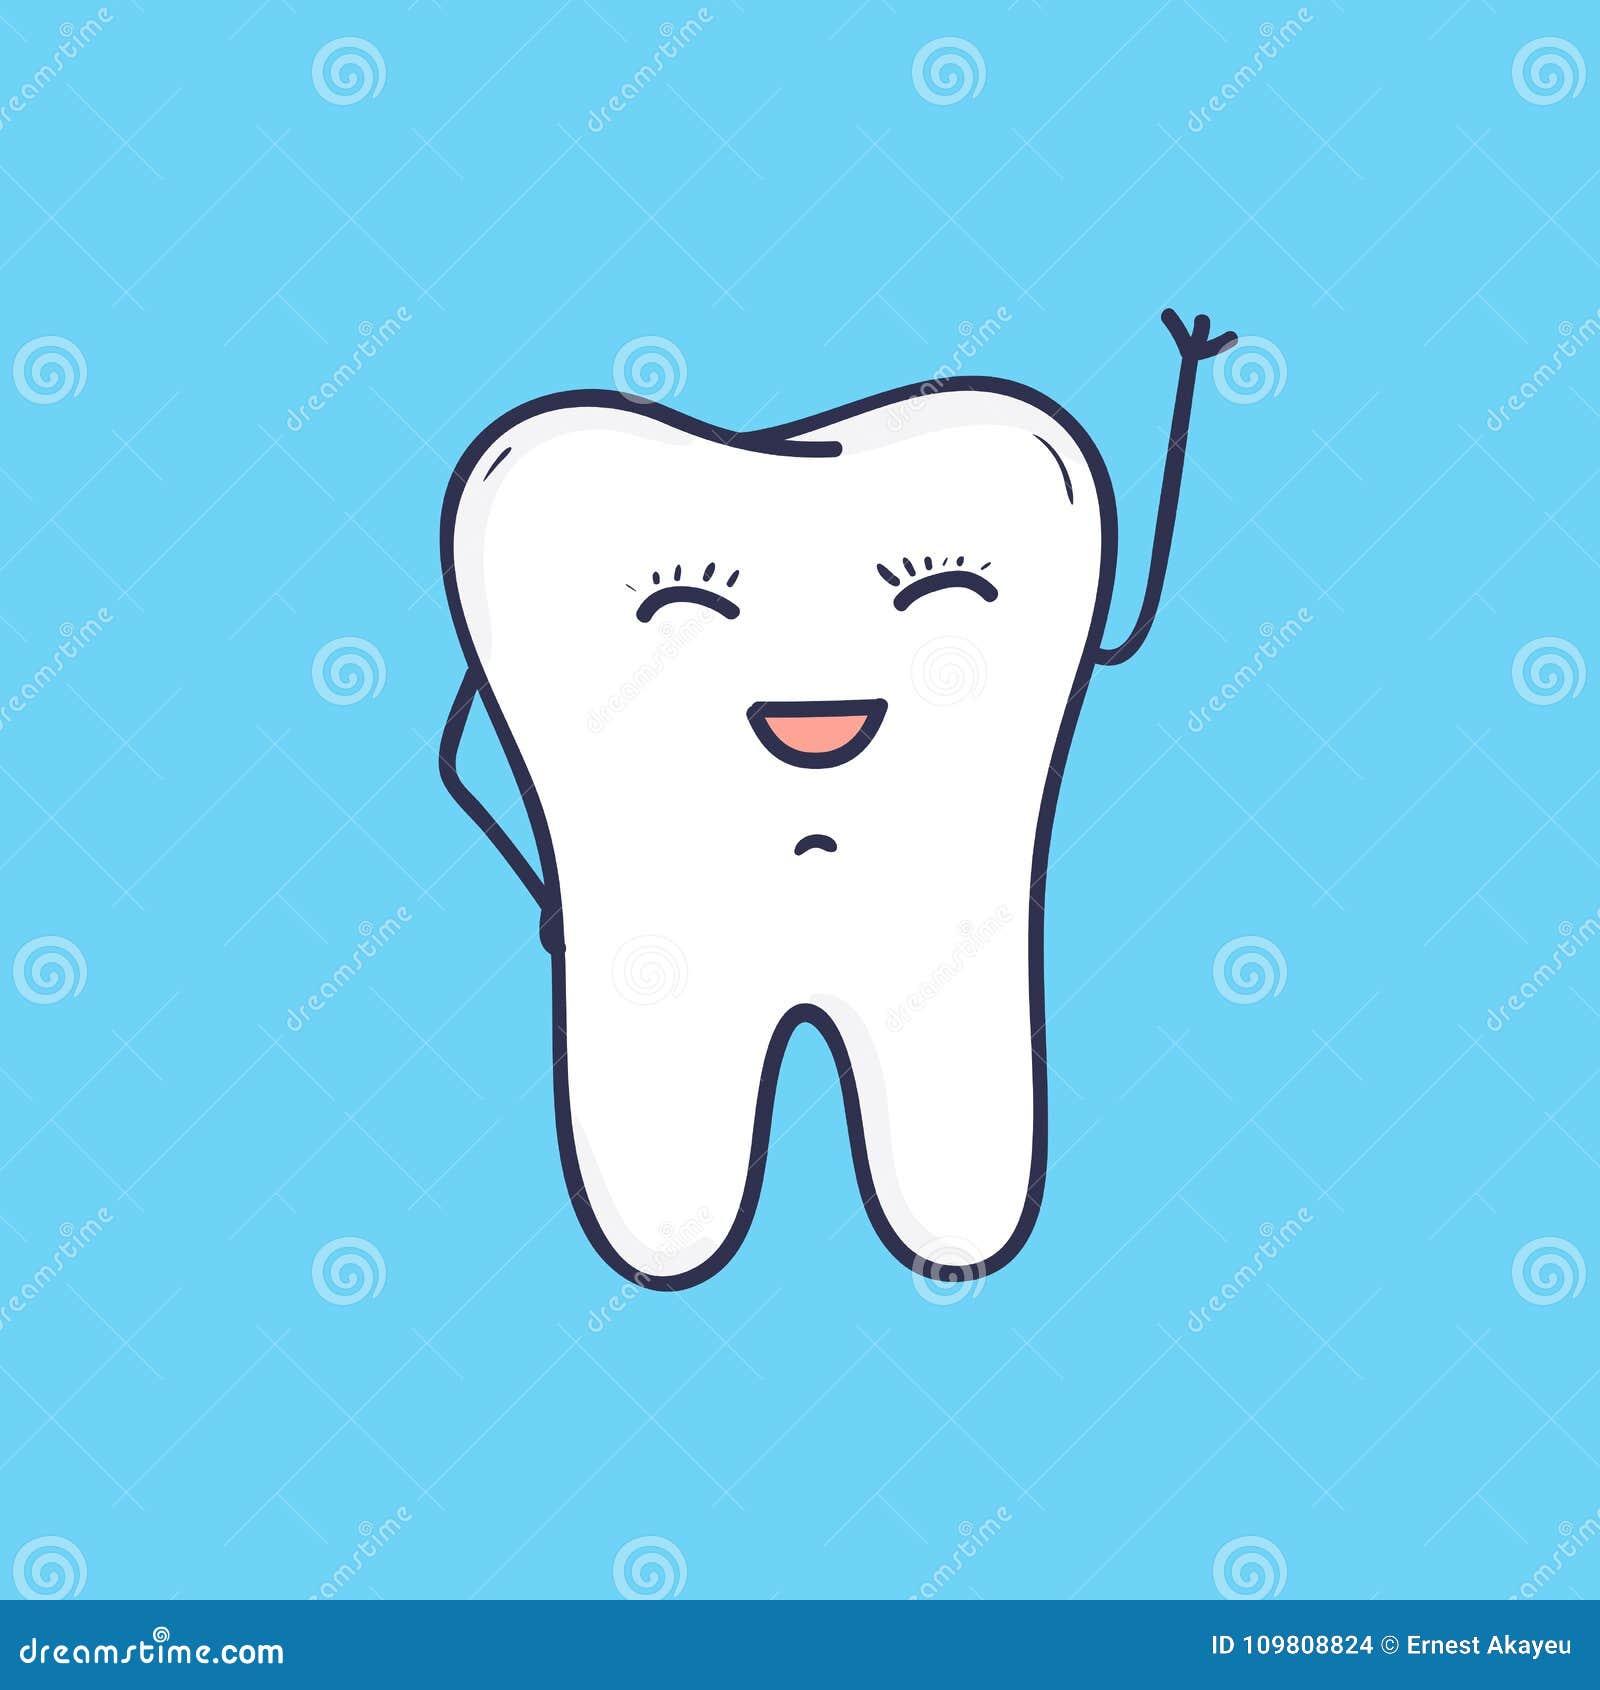 Funny Smiling Tooth Waving Hand Beautiful Joyful Mascot Or Symbol